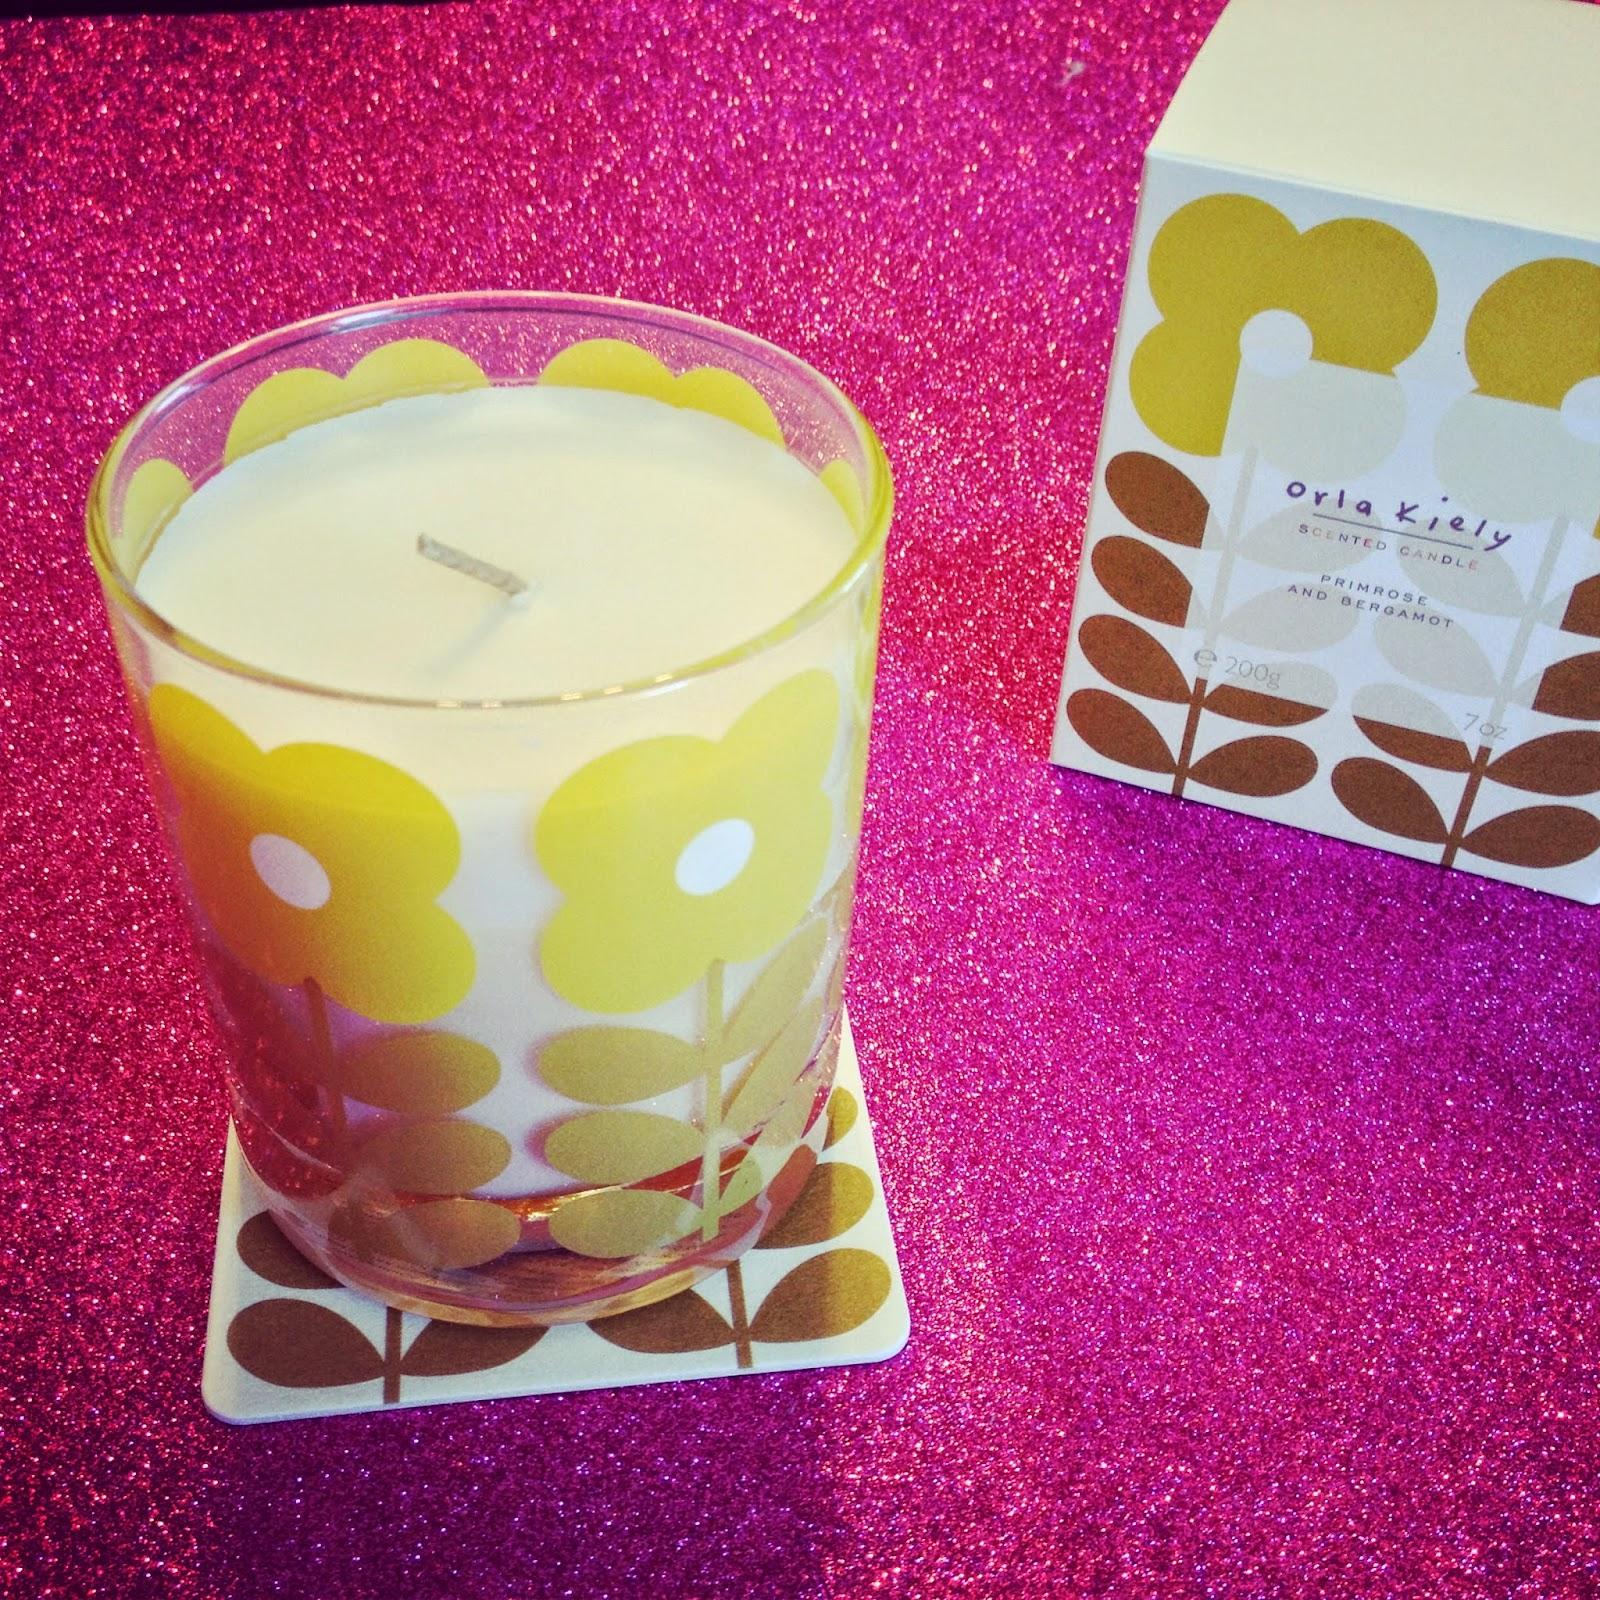 Orla Kiely Candles